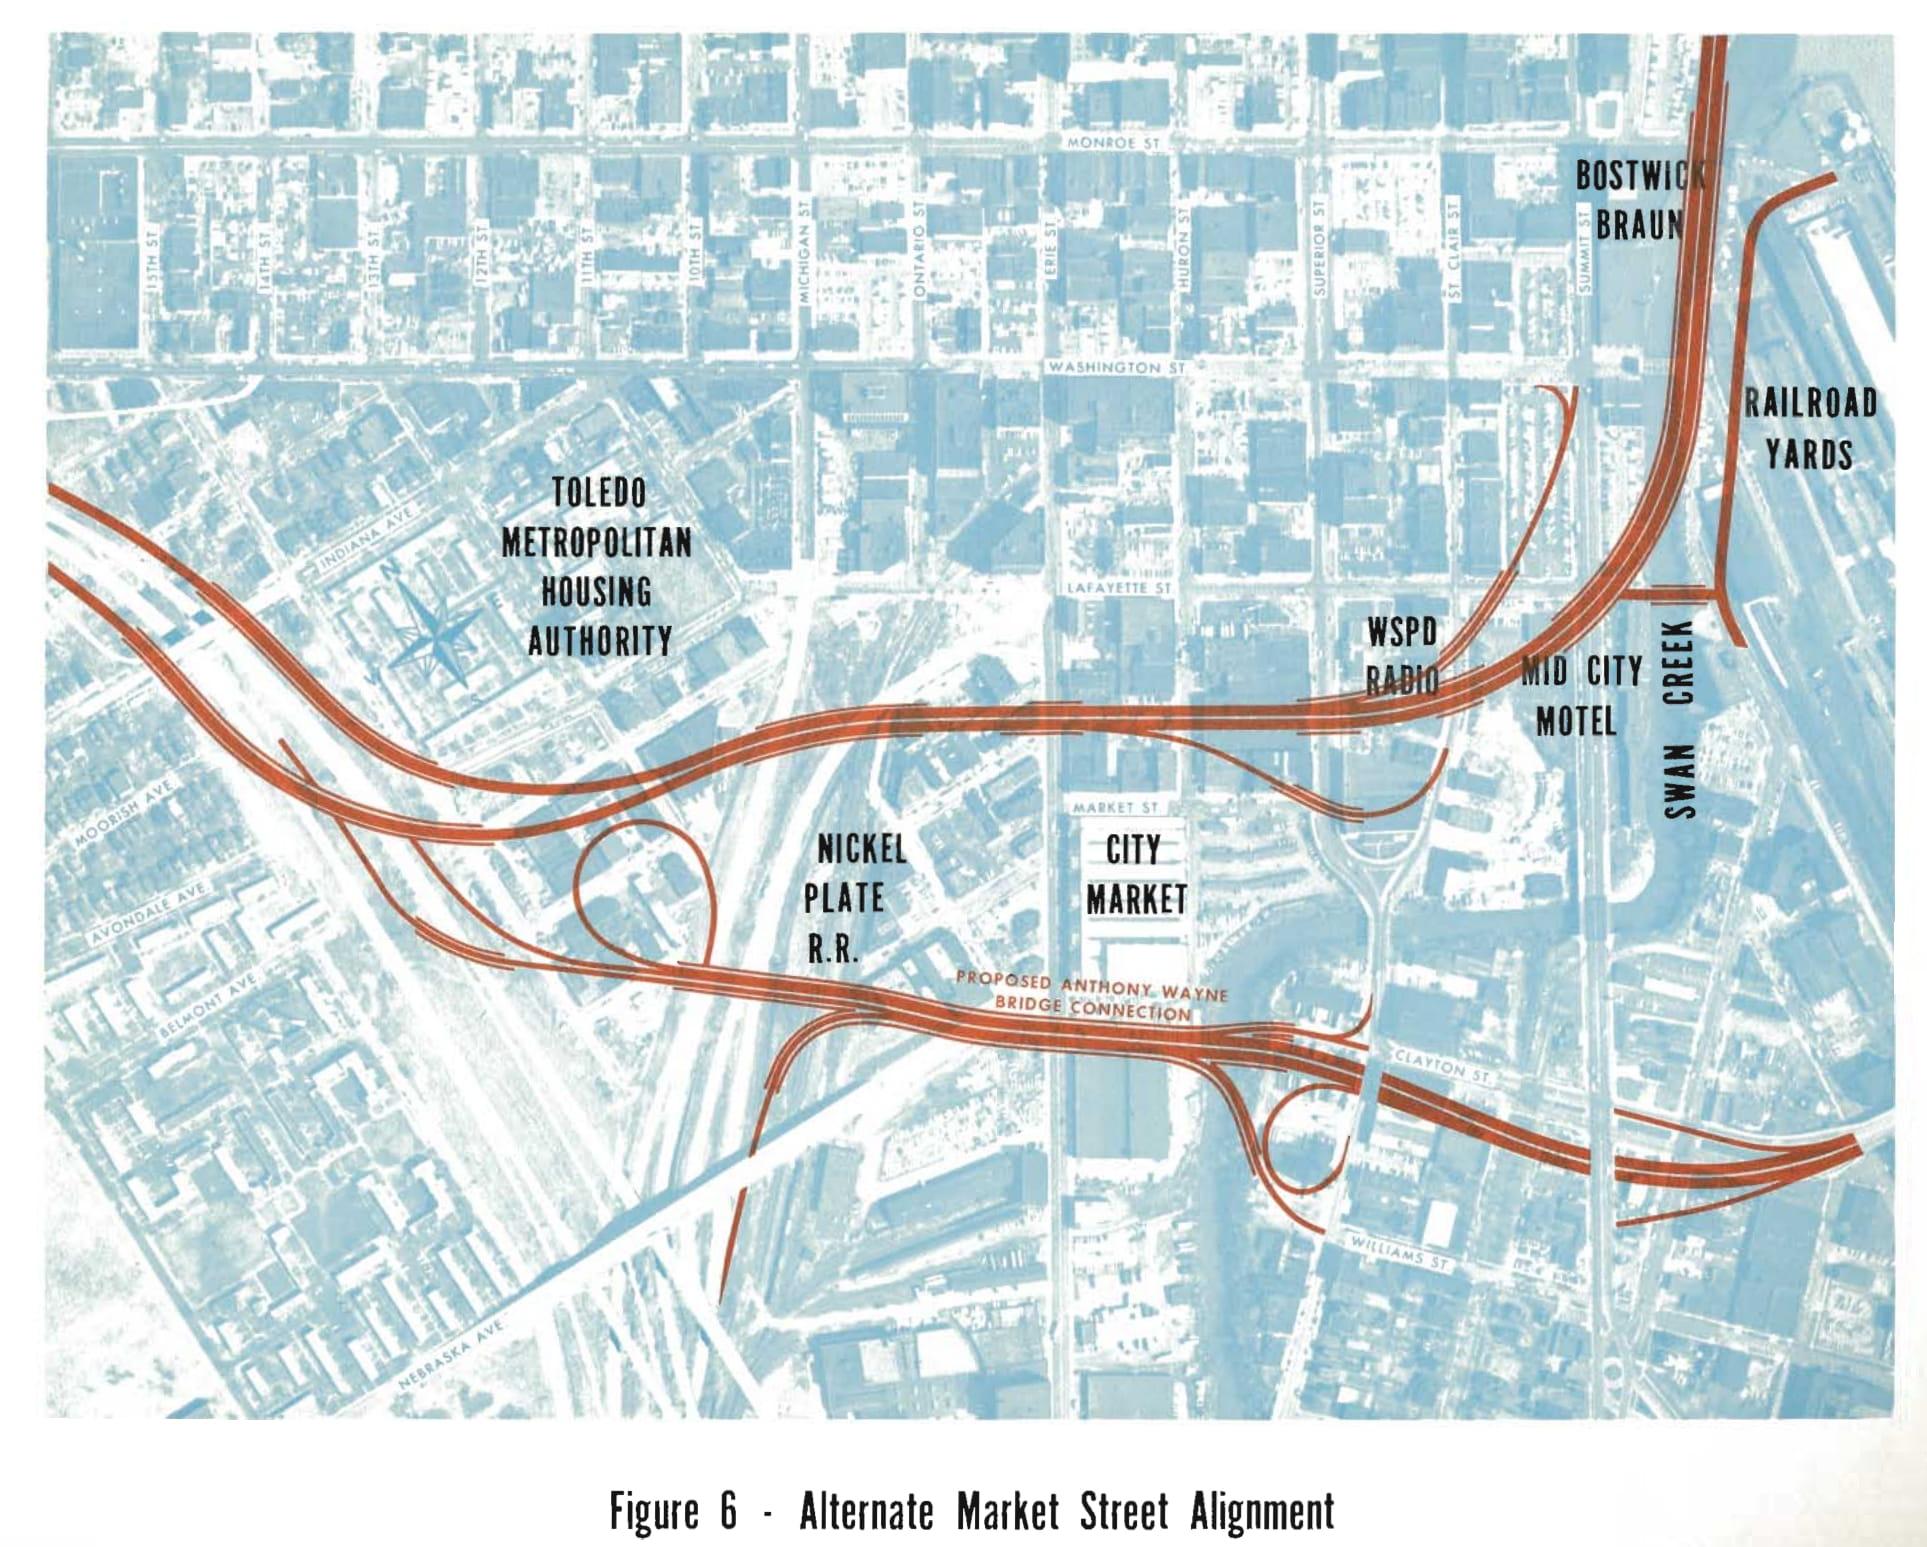 toledo downtown distributor expressway-08